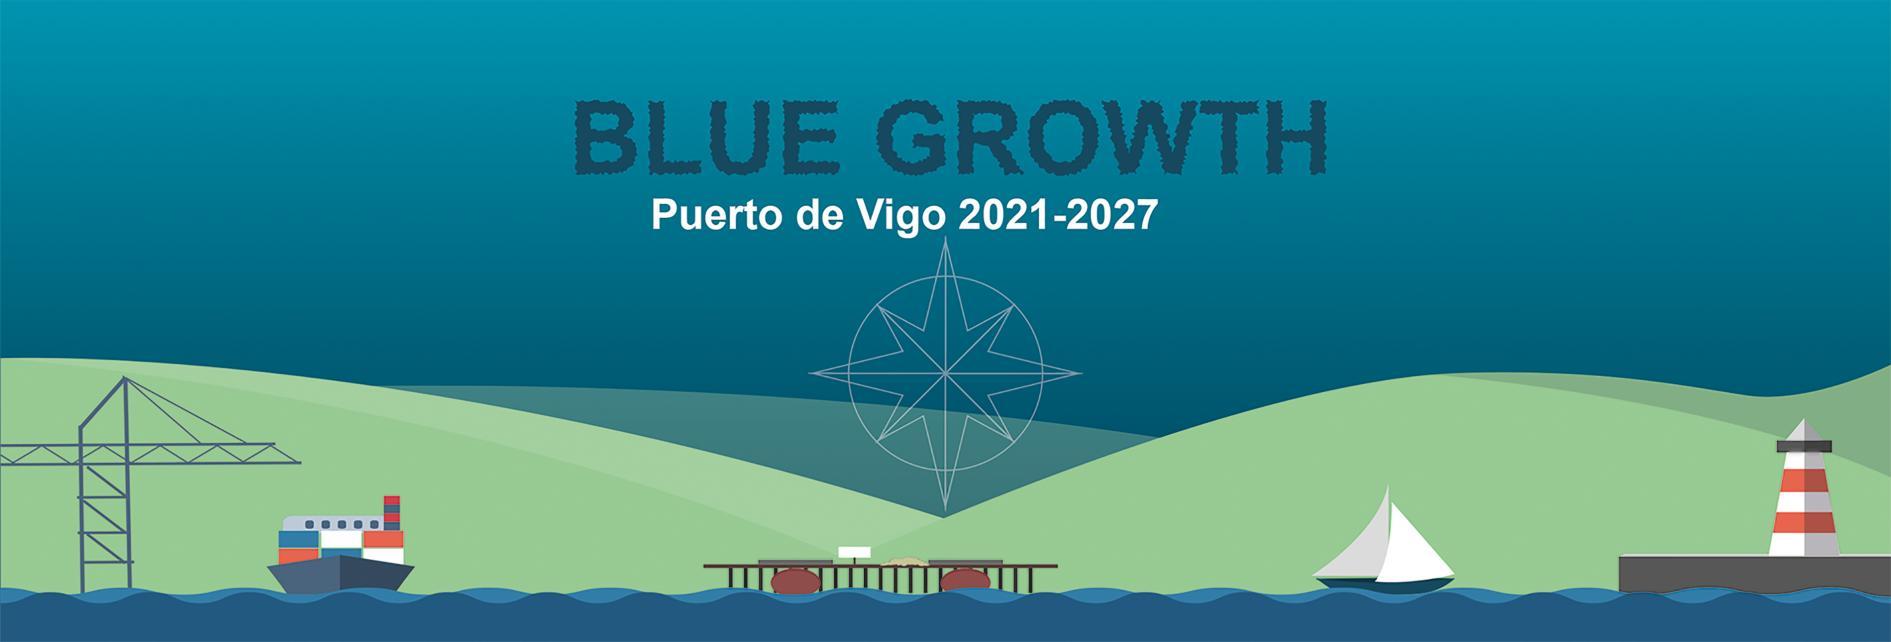 Blue Growth Puerto de Vigo